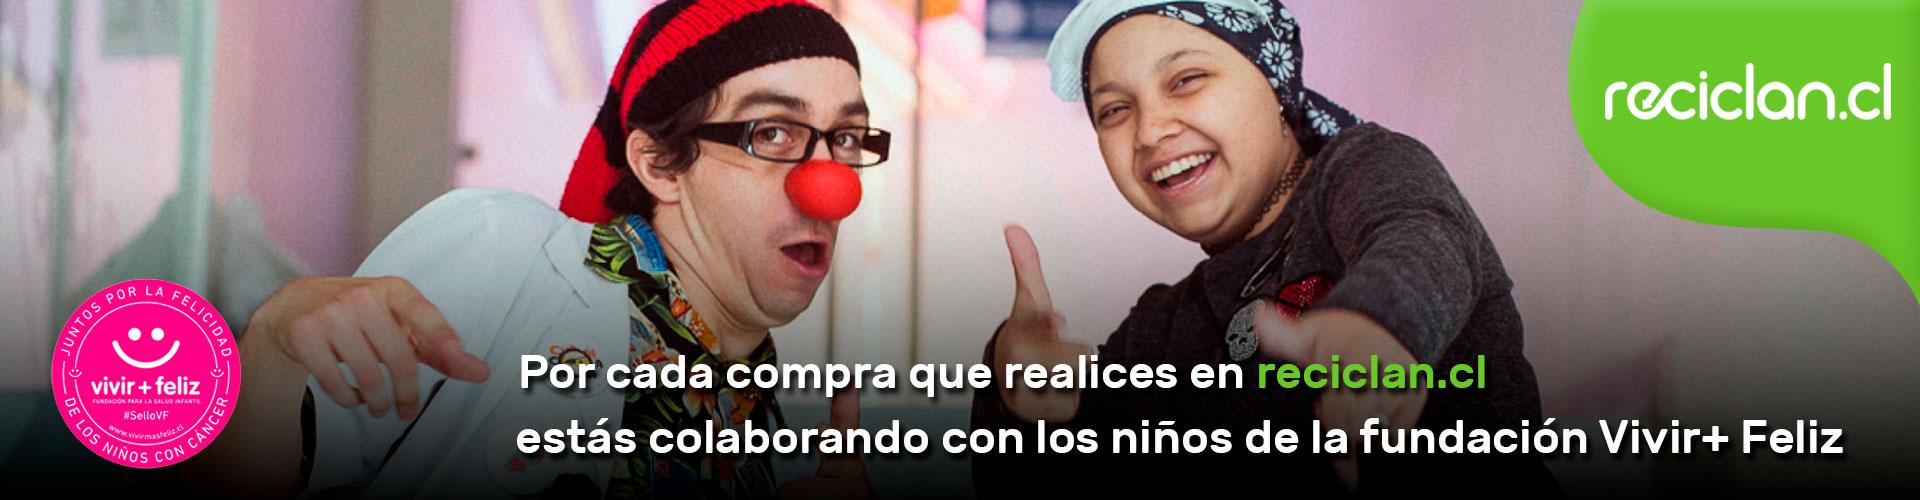 banner-reciclan-vivir-mas-feliz-1